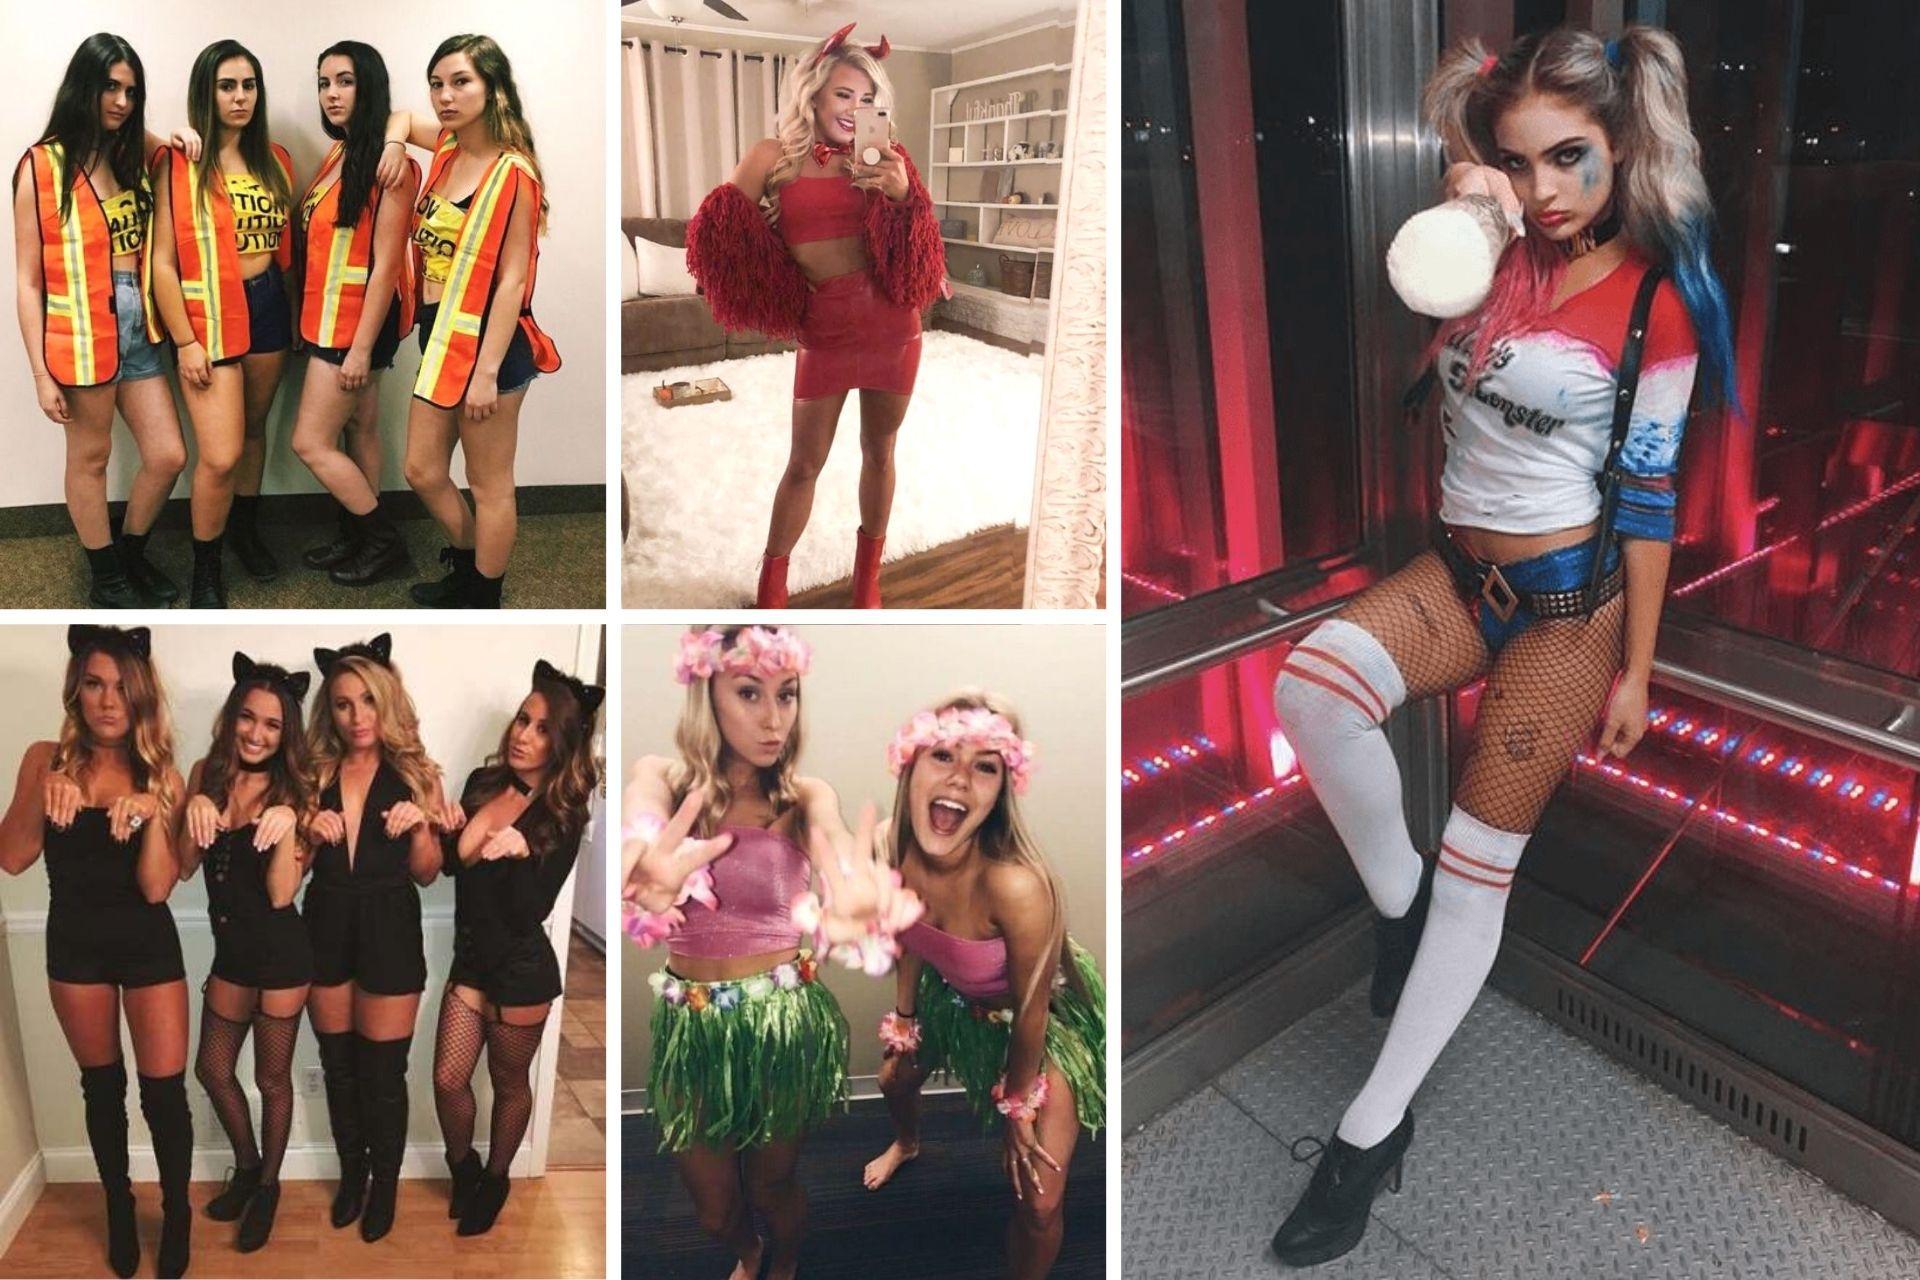 31 oct 2021 sun, oct 31, 2021 add to calendar halloween 2021. 50+ Halloween Costumes for Teenage Girls in 2021